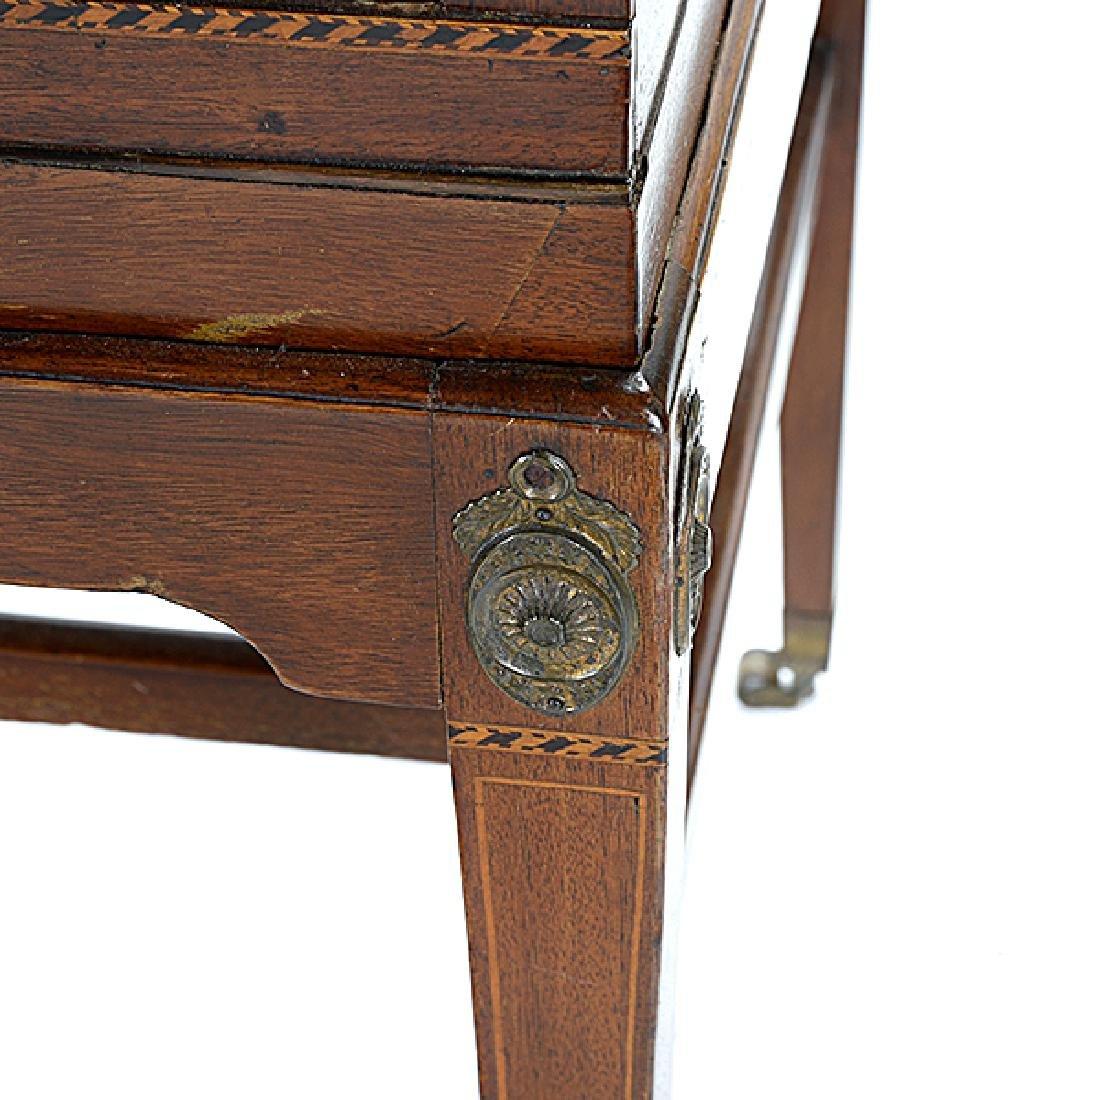 George III Style Inlaid Mahogany Desk - 3